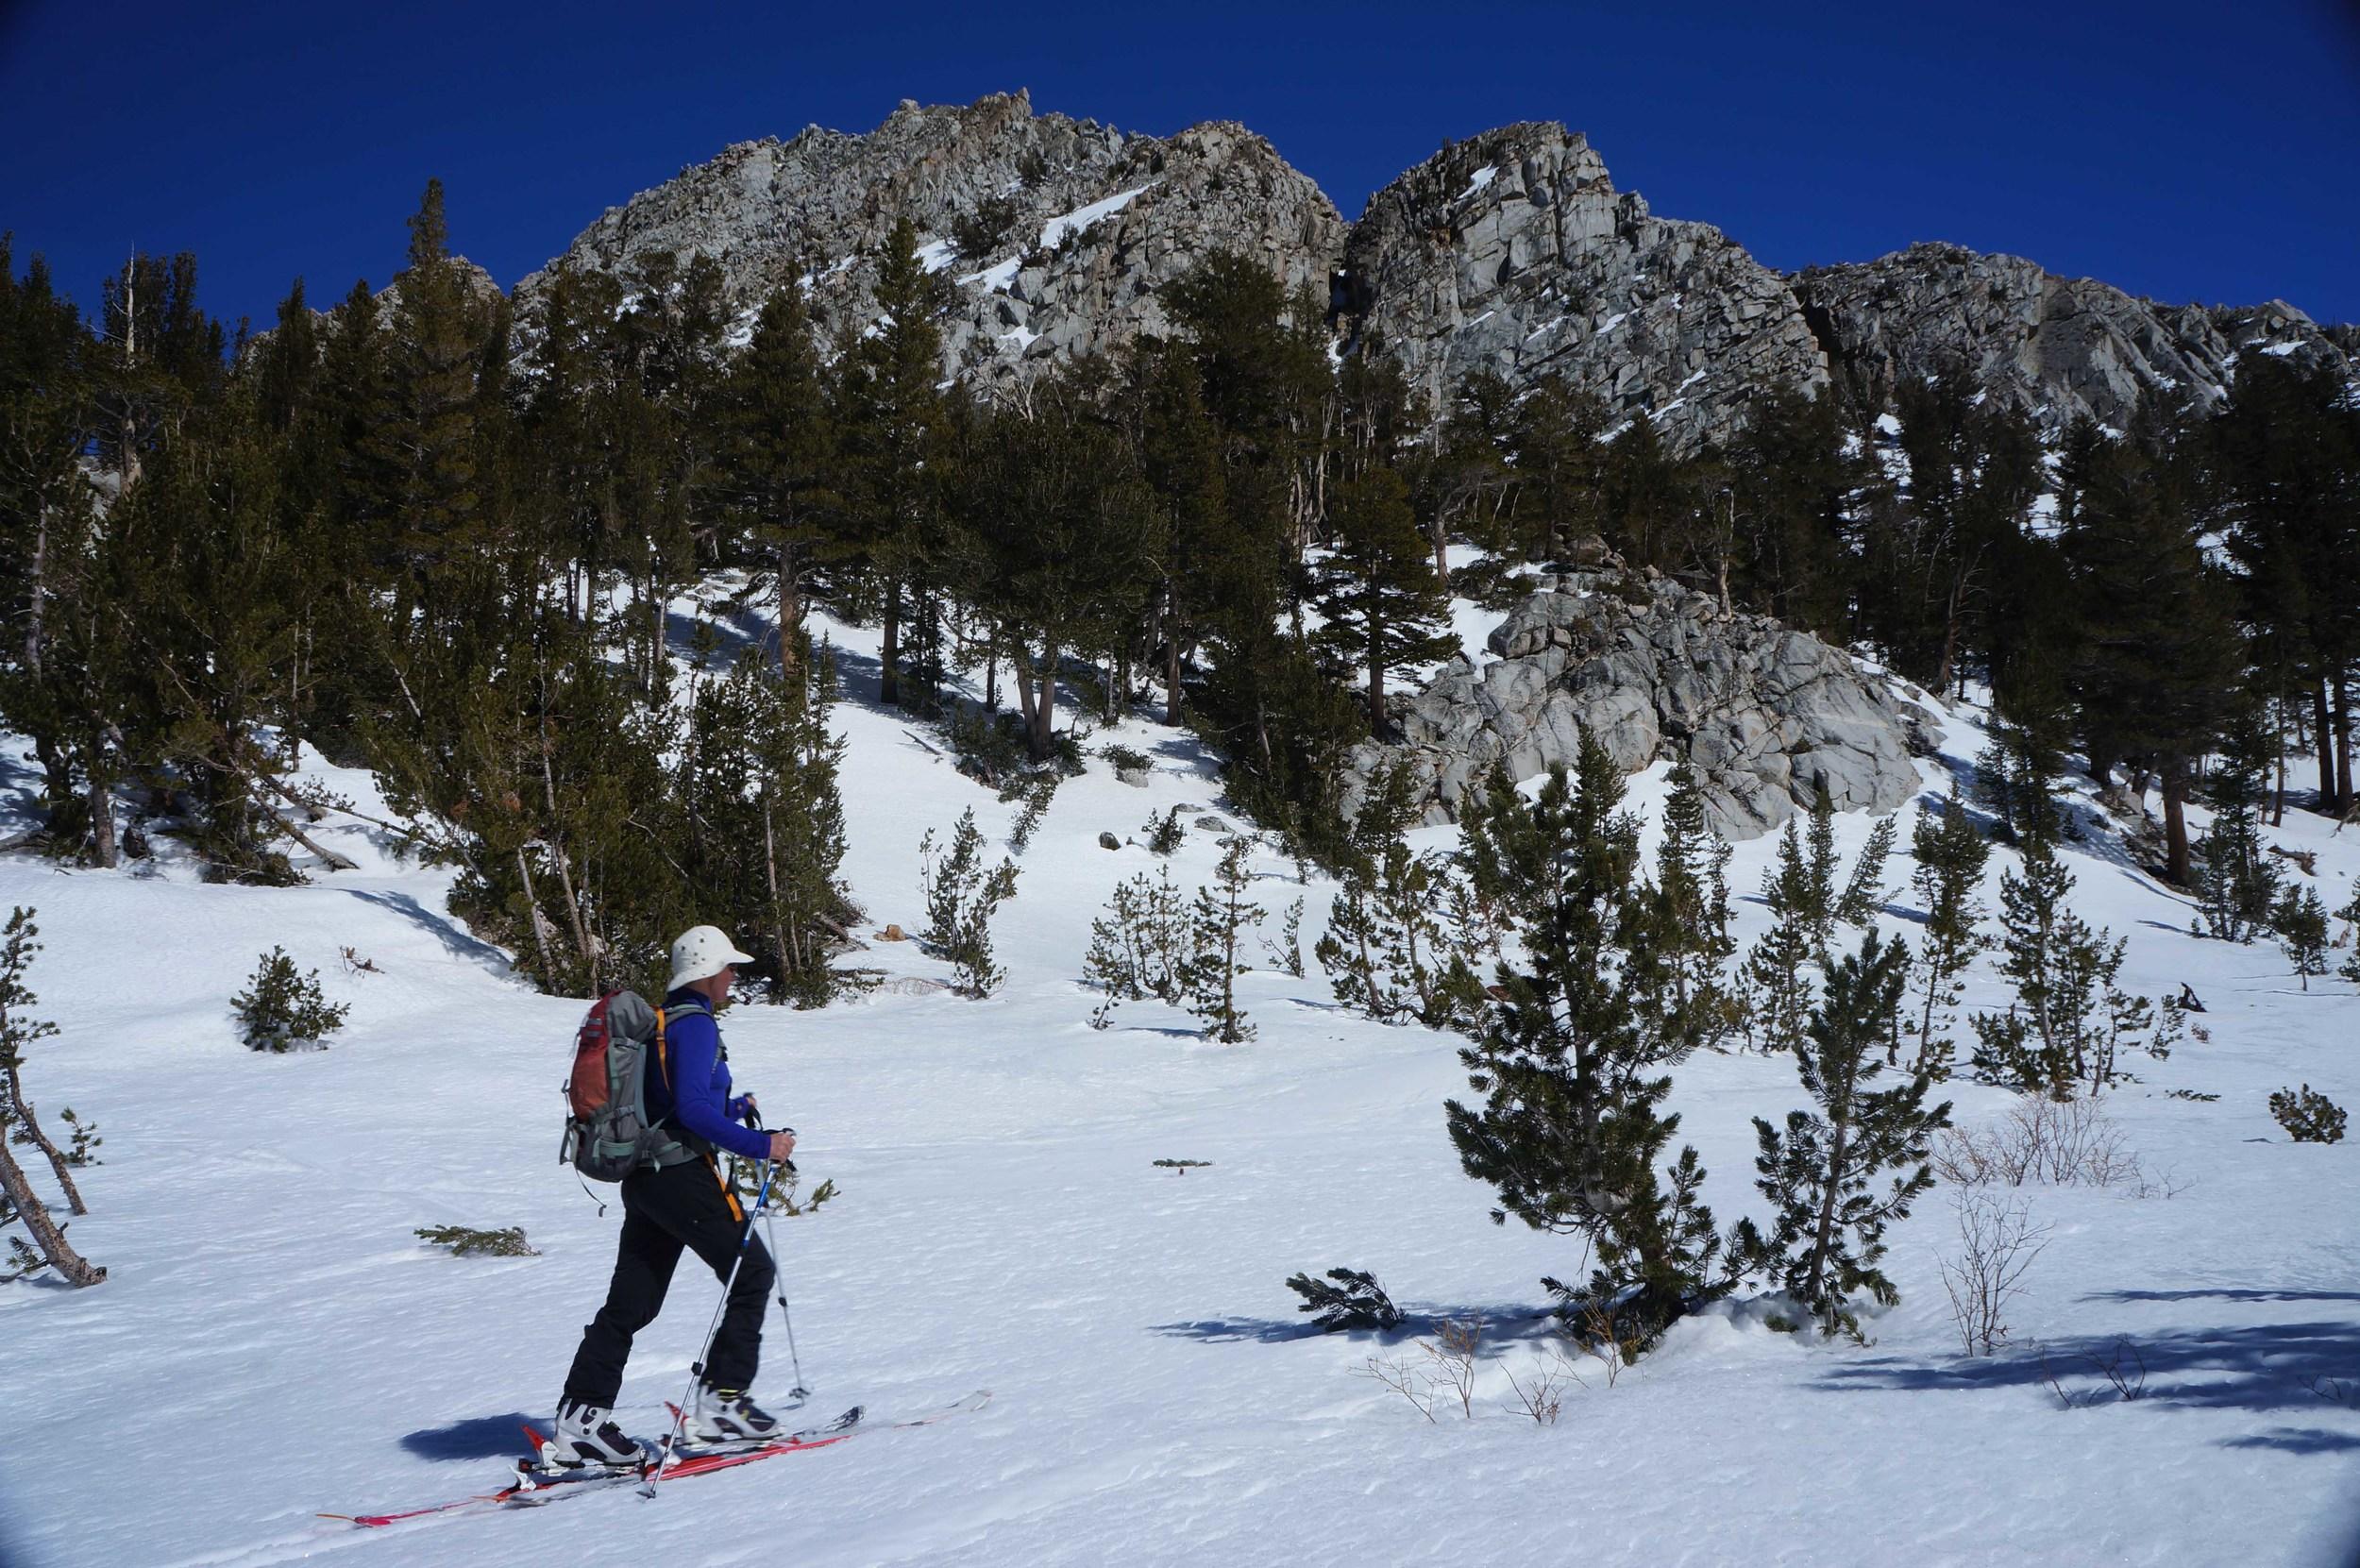 Ski touring near Mammoth